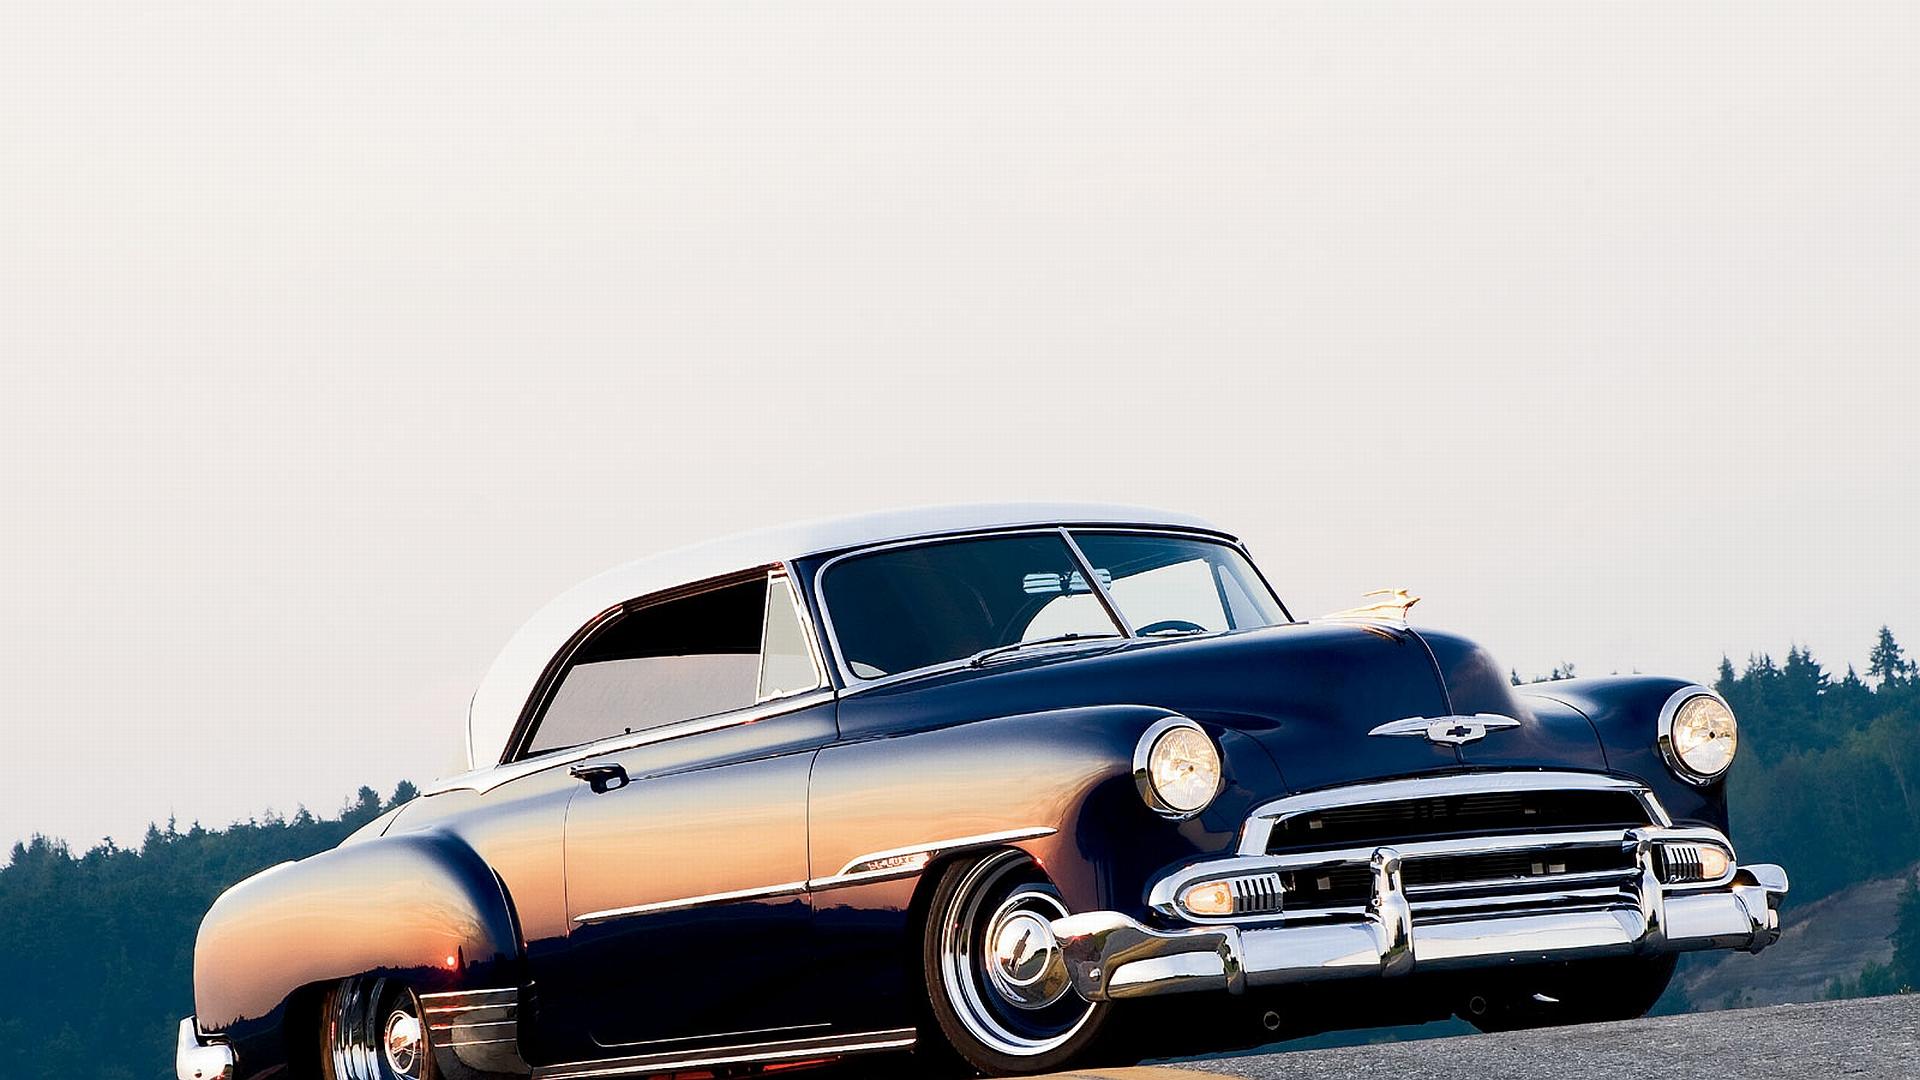 Chevrolet wallpaper Chevrolet stock photos